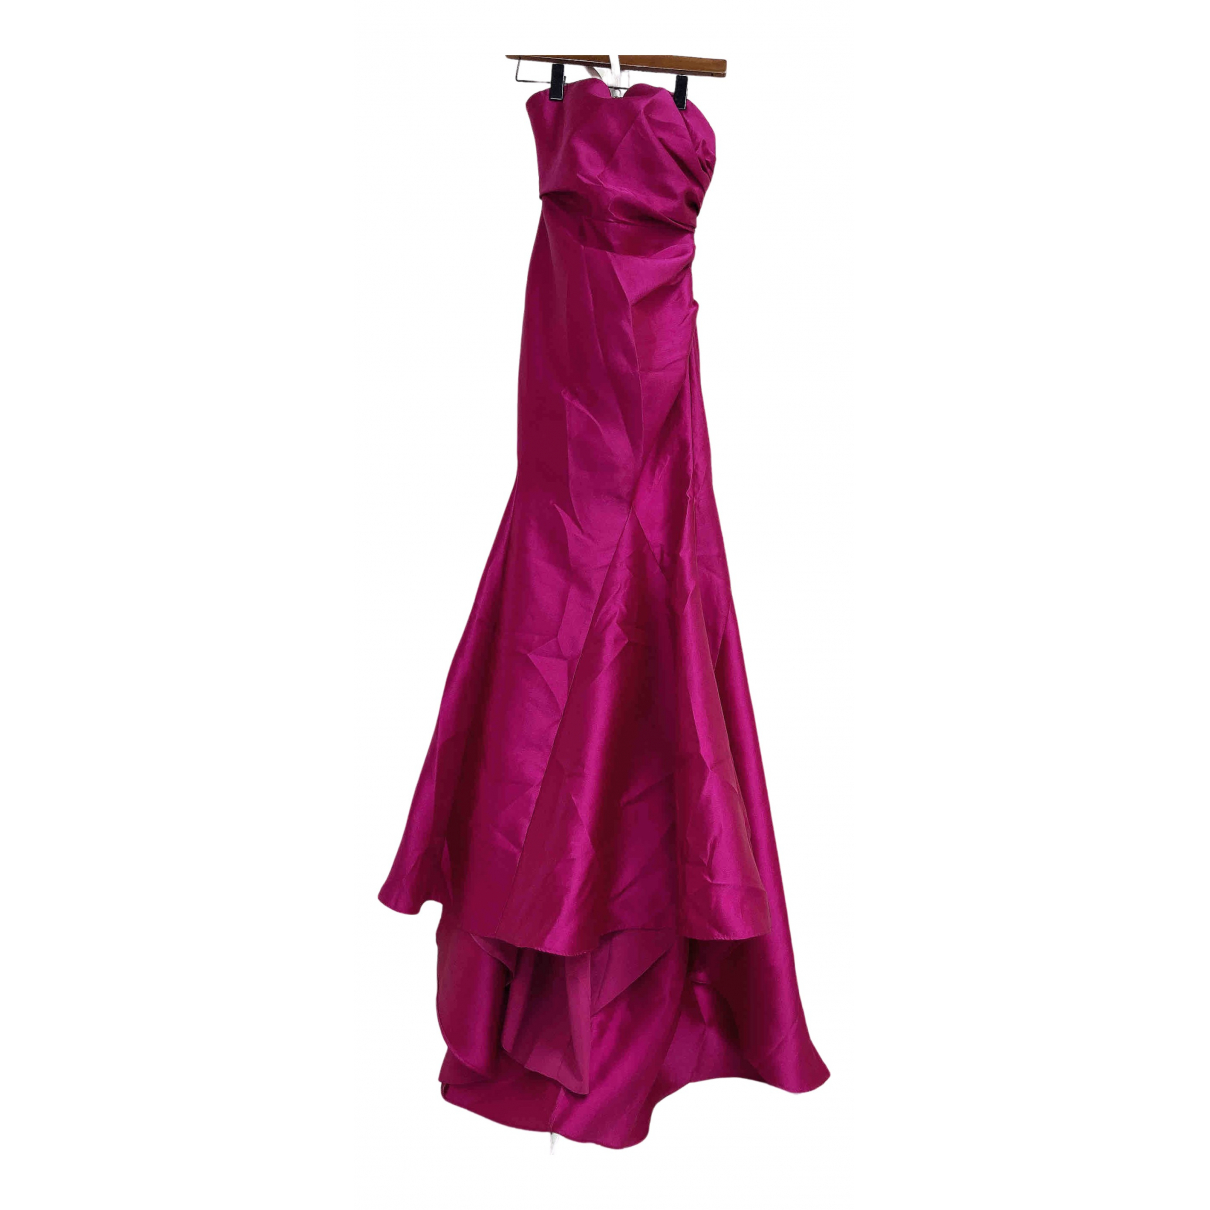 Badgley Mischka \N Kleid in  Lila Polyester